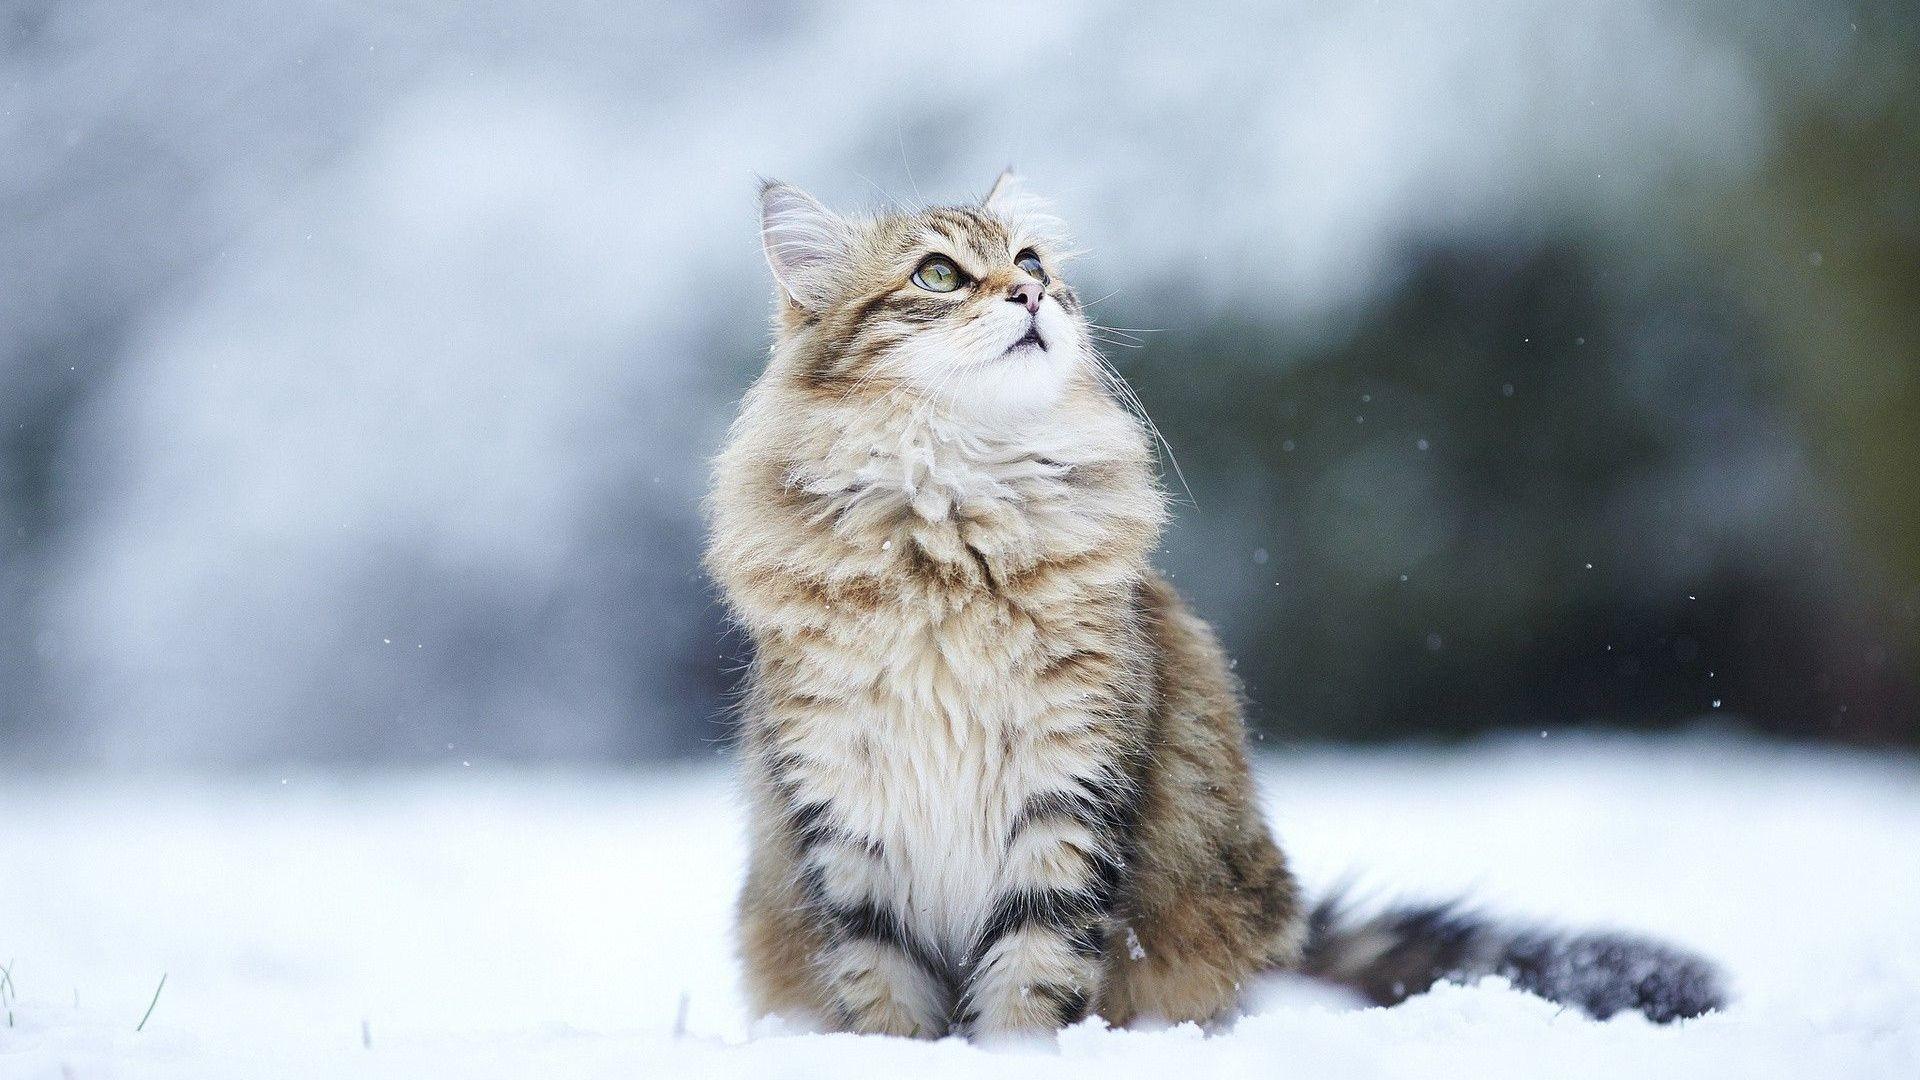 cat-winter-hd-wallpaper-taborat-winter-cats-wallpaper-